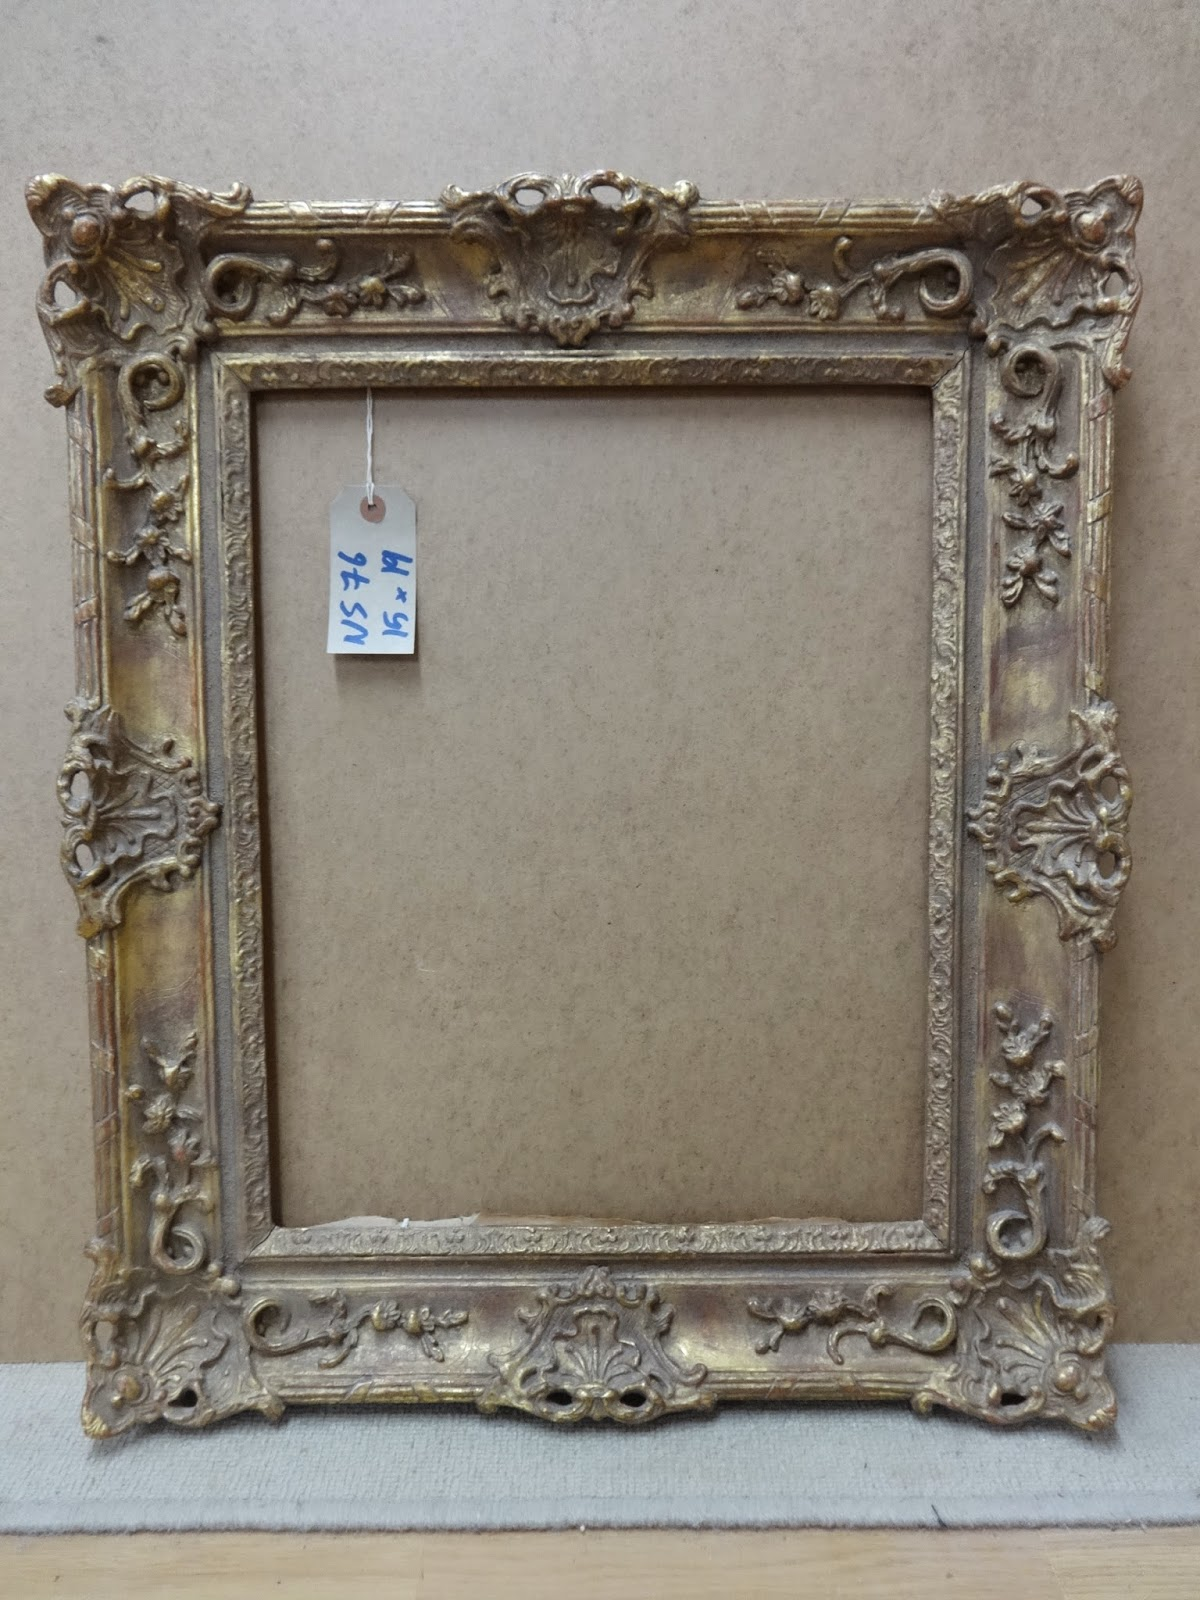 Antique Frame Sale: A Reproduction Louis XV Swept Frame